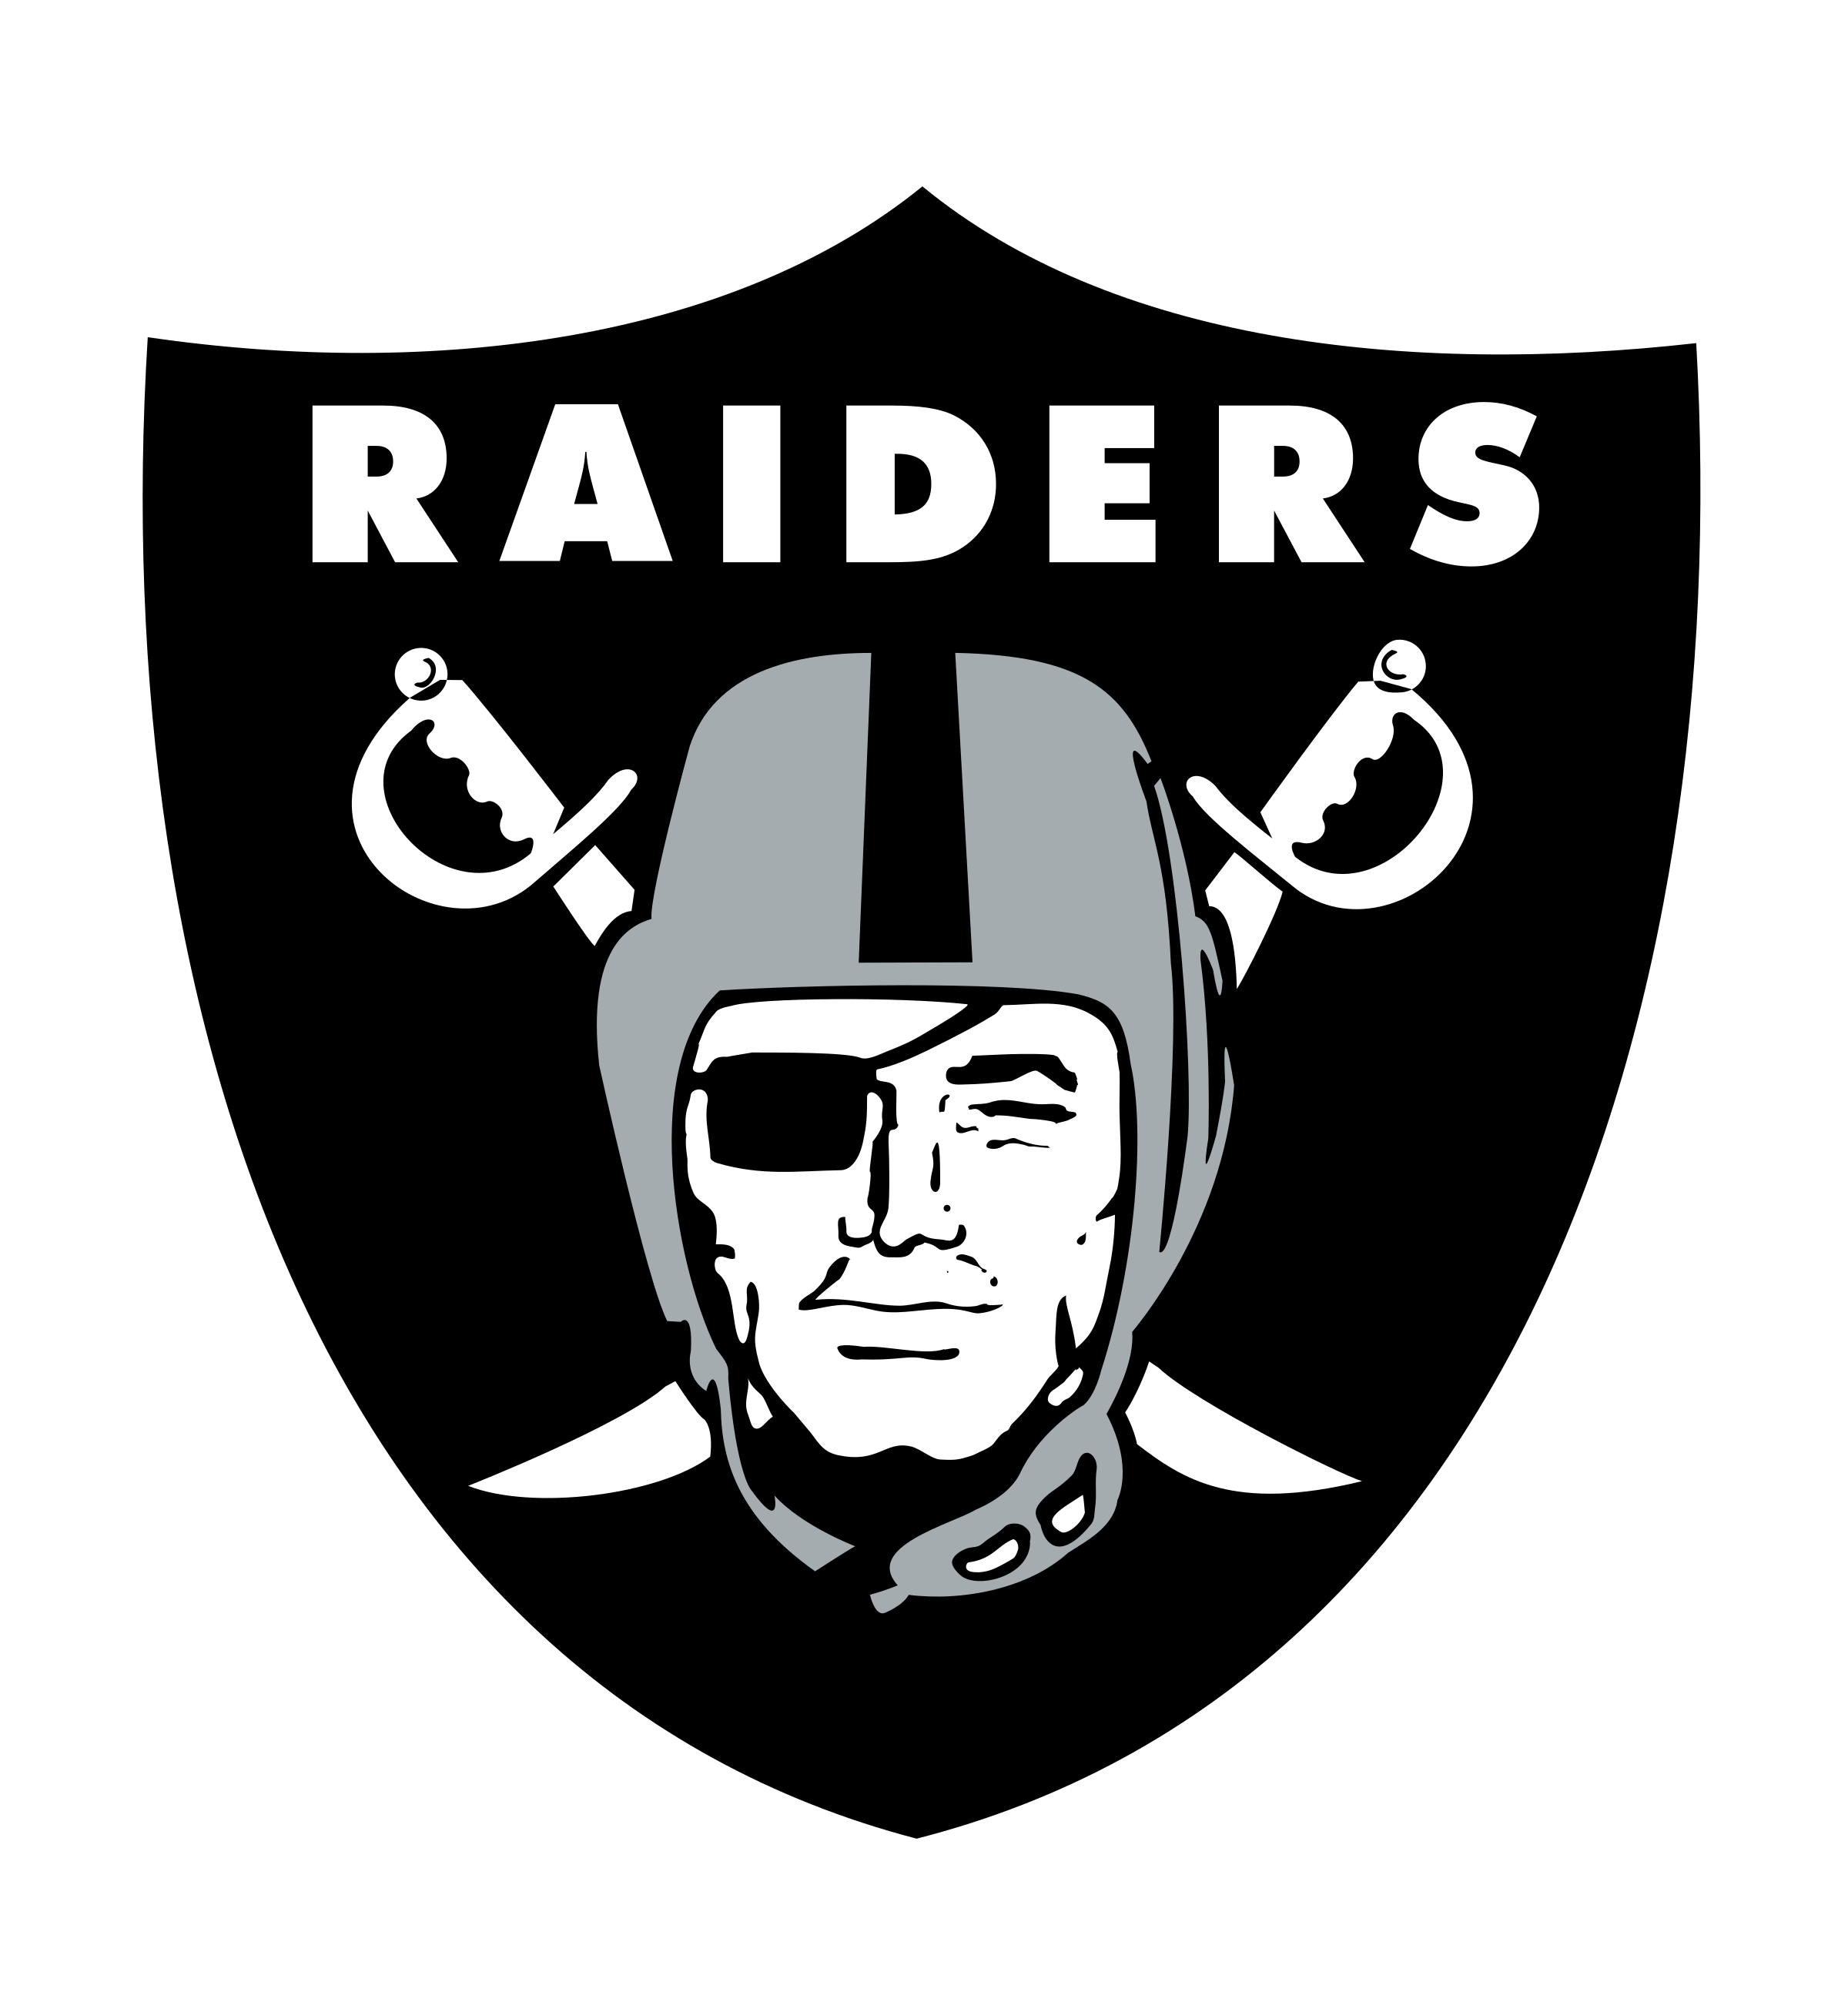 Oakland Raiders Logo Png Transparent Svg Vector Freebie Oakland Raiders Logo Nfl Oakland Raiders Raiders Football